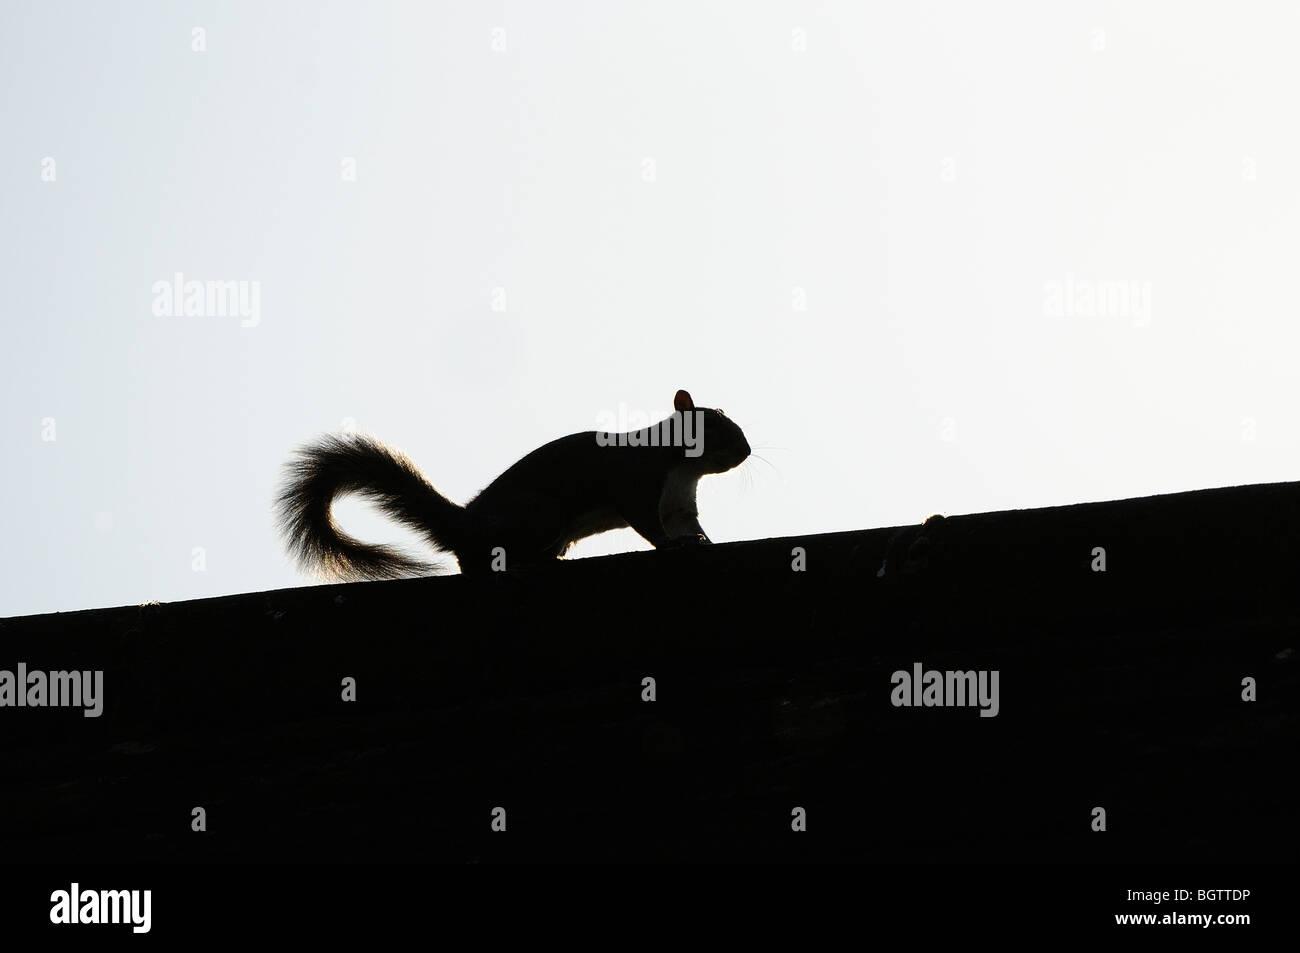 Eastern Grey Squirrel (Sciurus caarolinensis) silhouette on roof, Oxfordshire, UK. - Stock Image